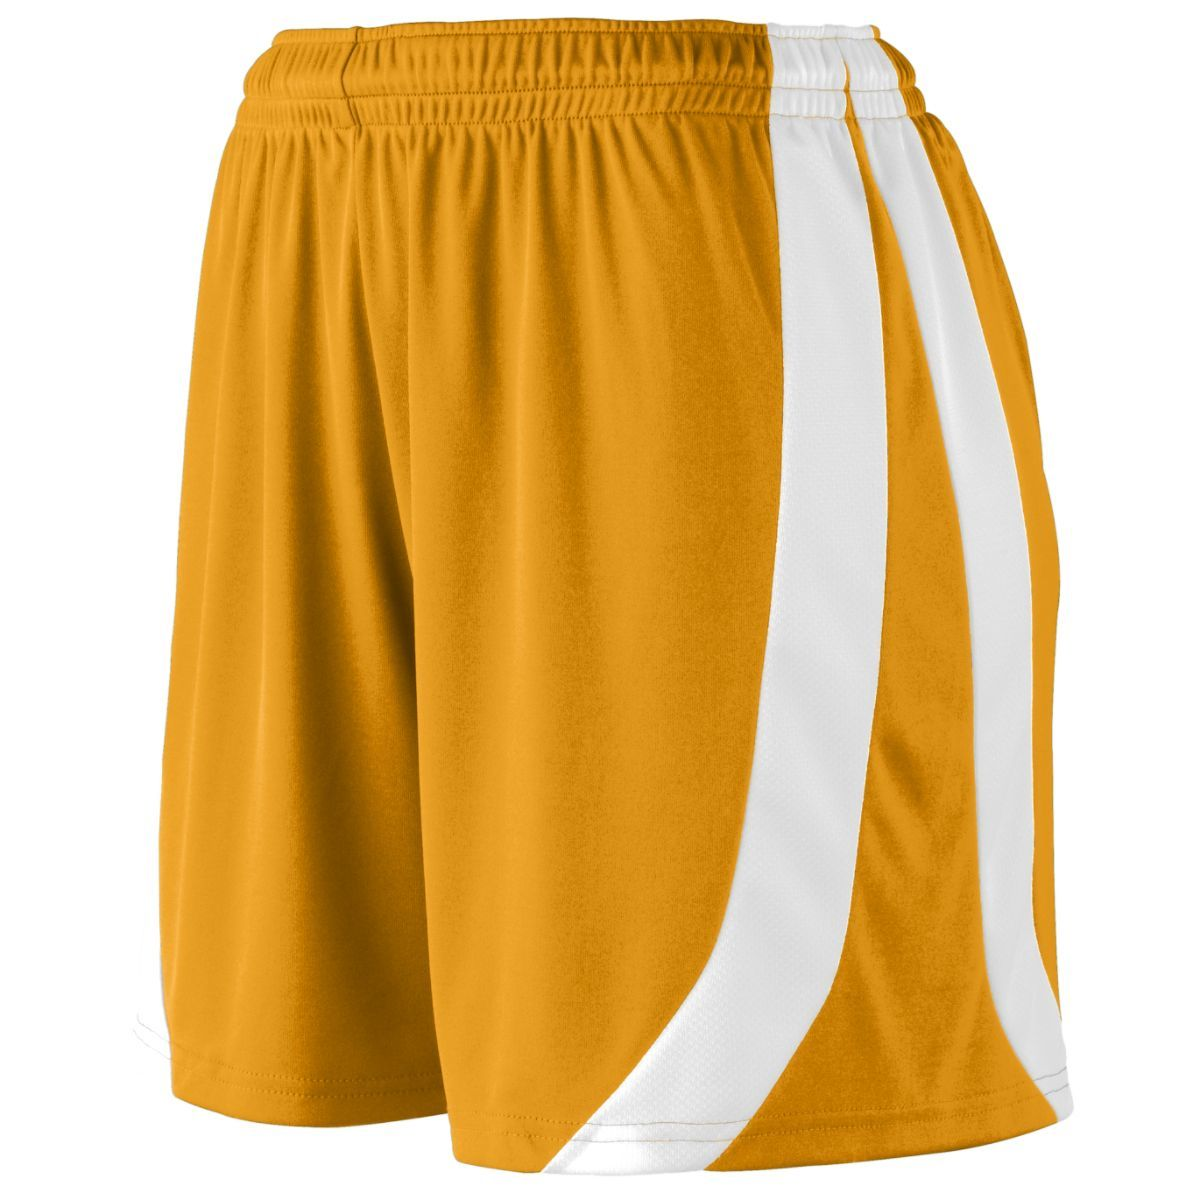 Ladies Triumph Shorts - GOLD/WHITE